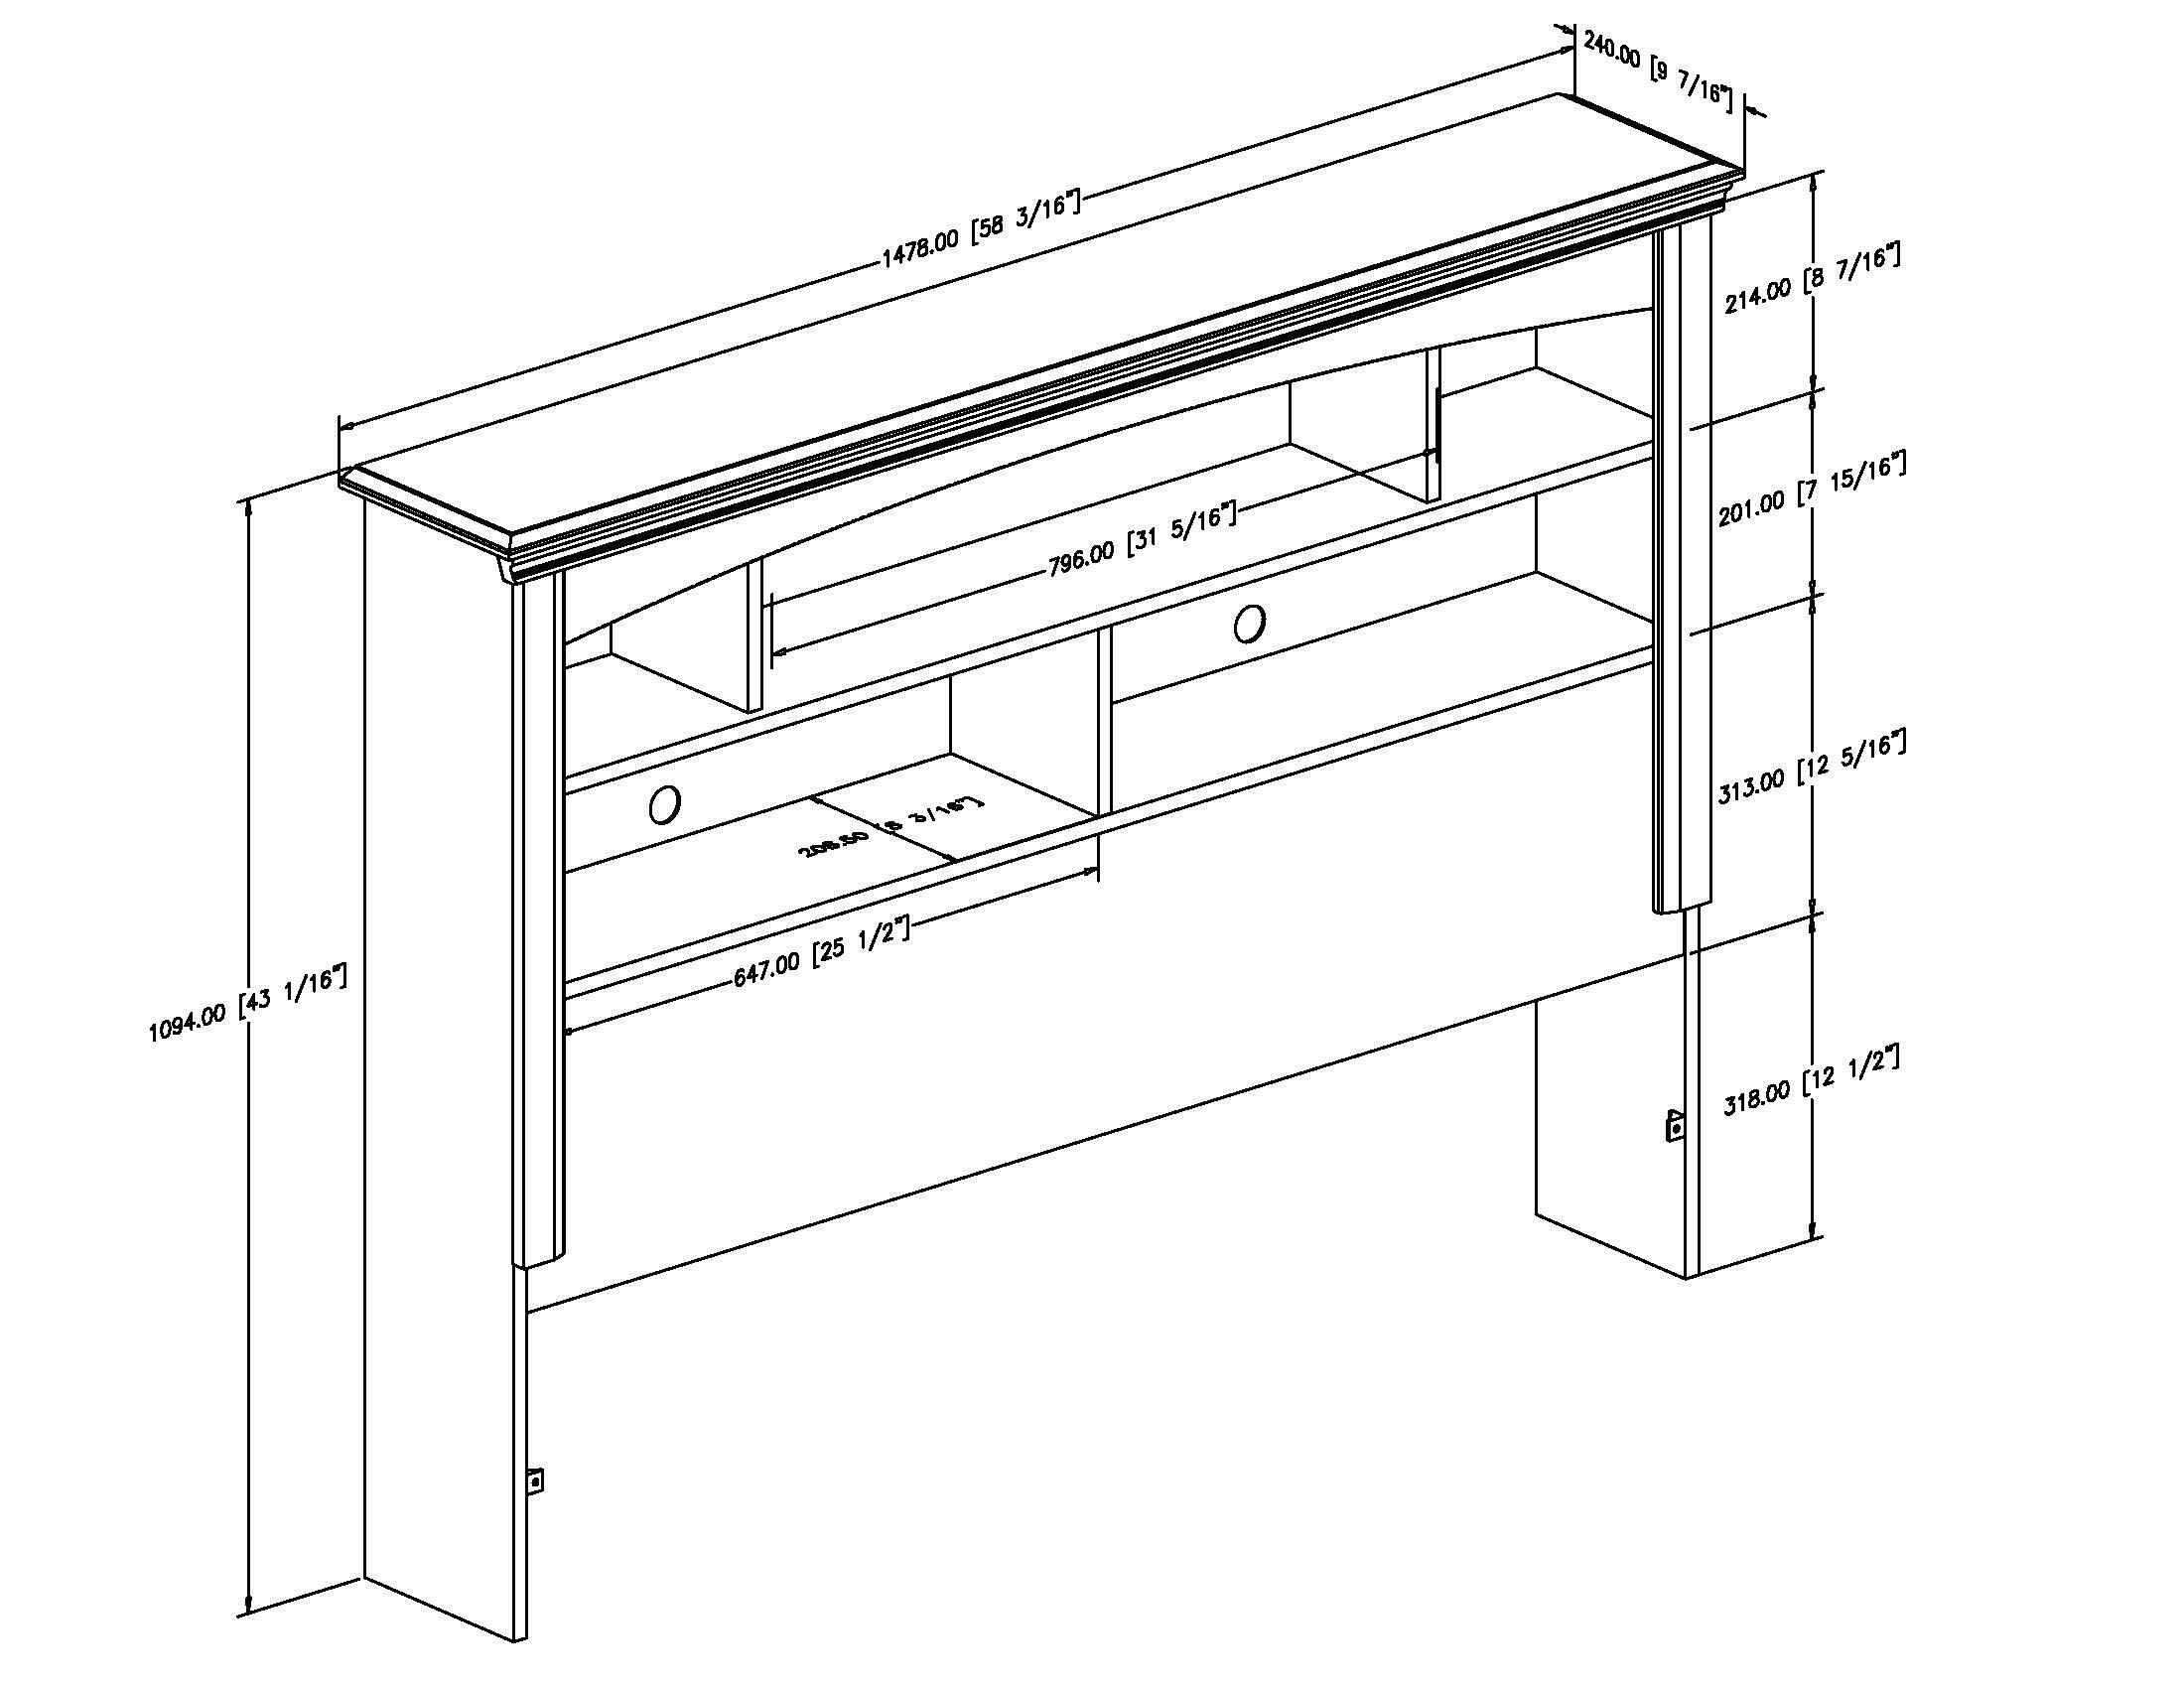 Woodwork Plans Bookshelf Headboard Pdf Plans Headboard Plan Bookshelf Headboard Woodworking Shop Storage Ideas